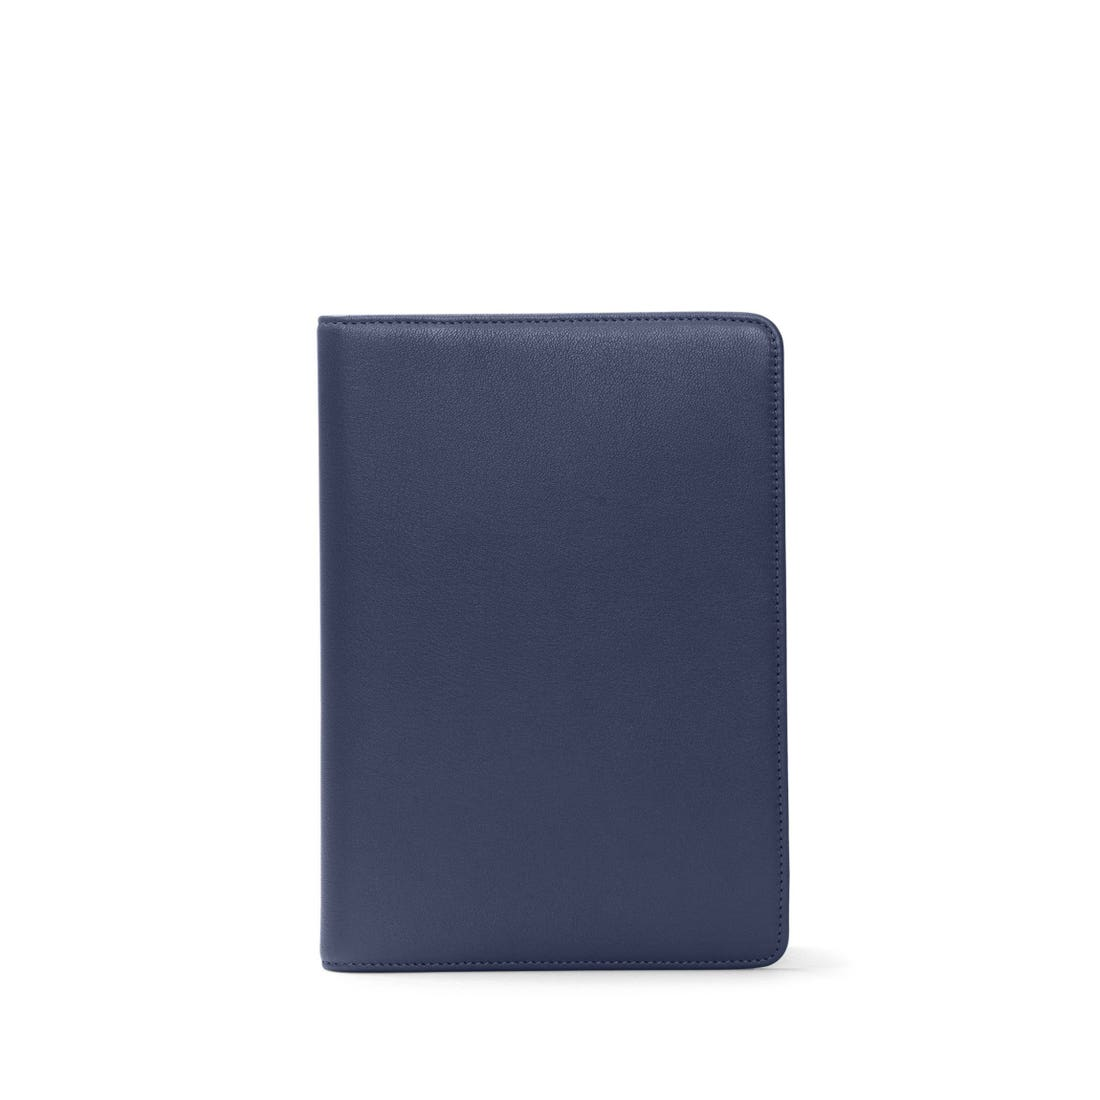 Medium Journal